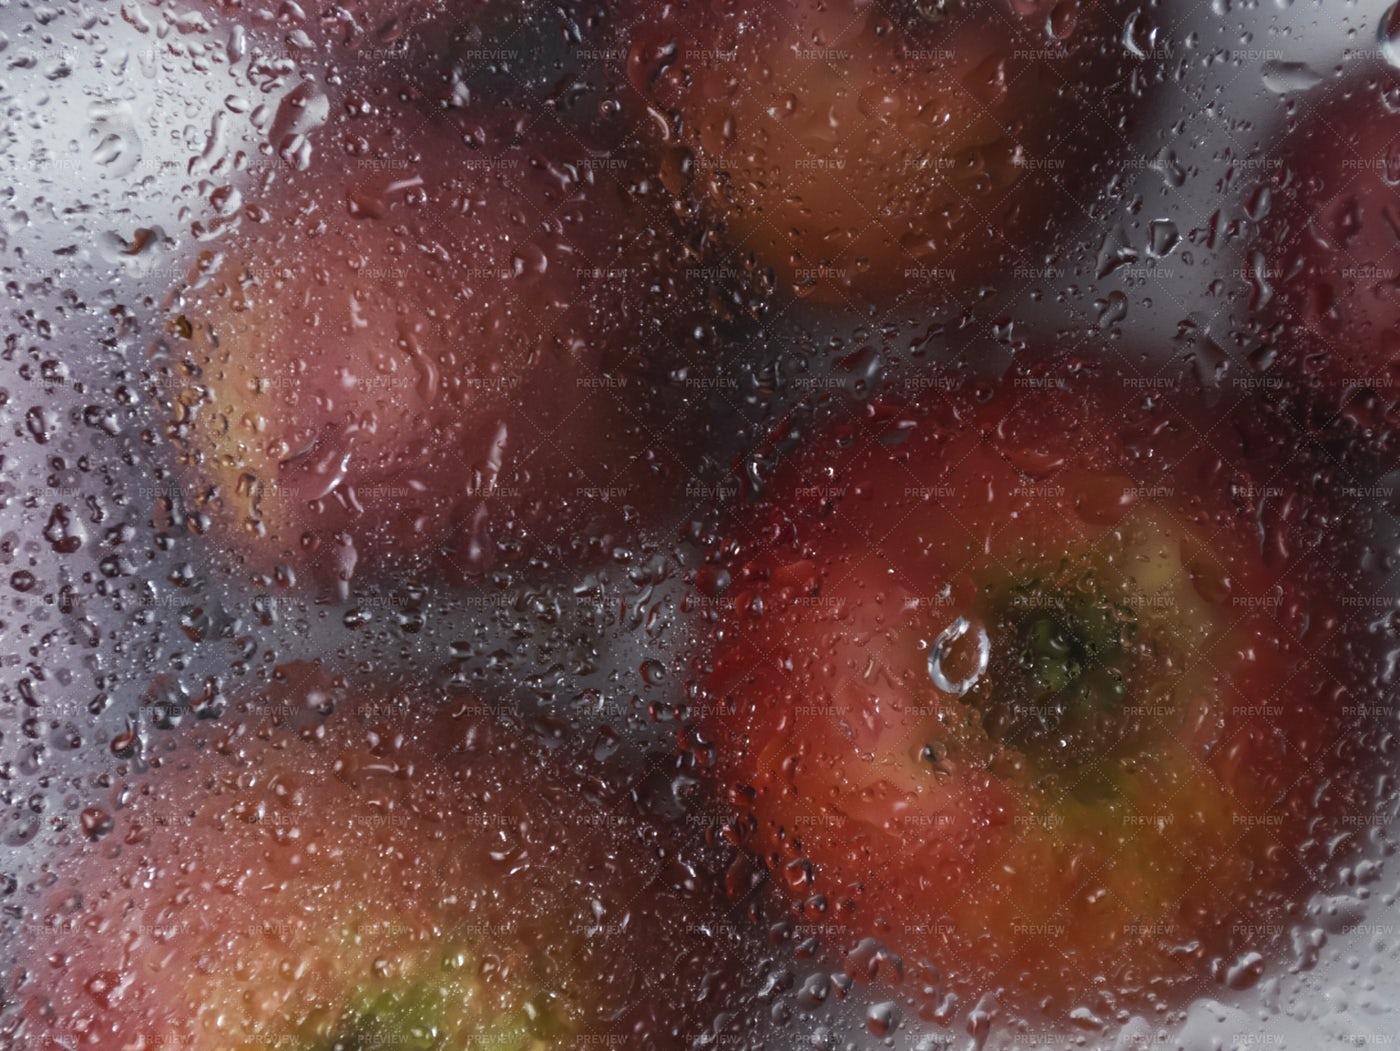 Apples Behind Glass: Stock Photos